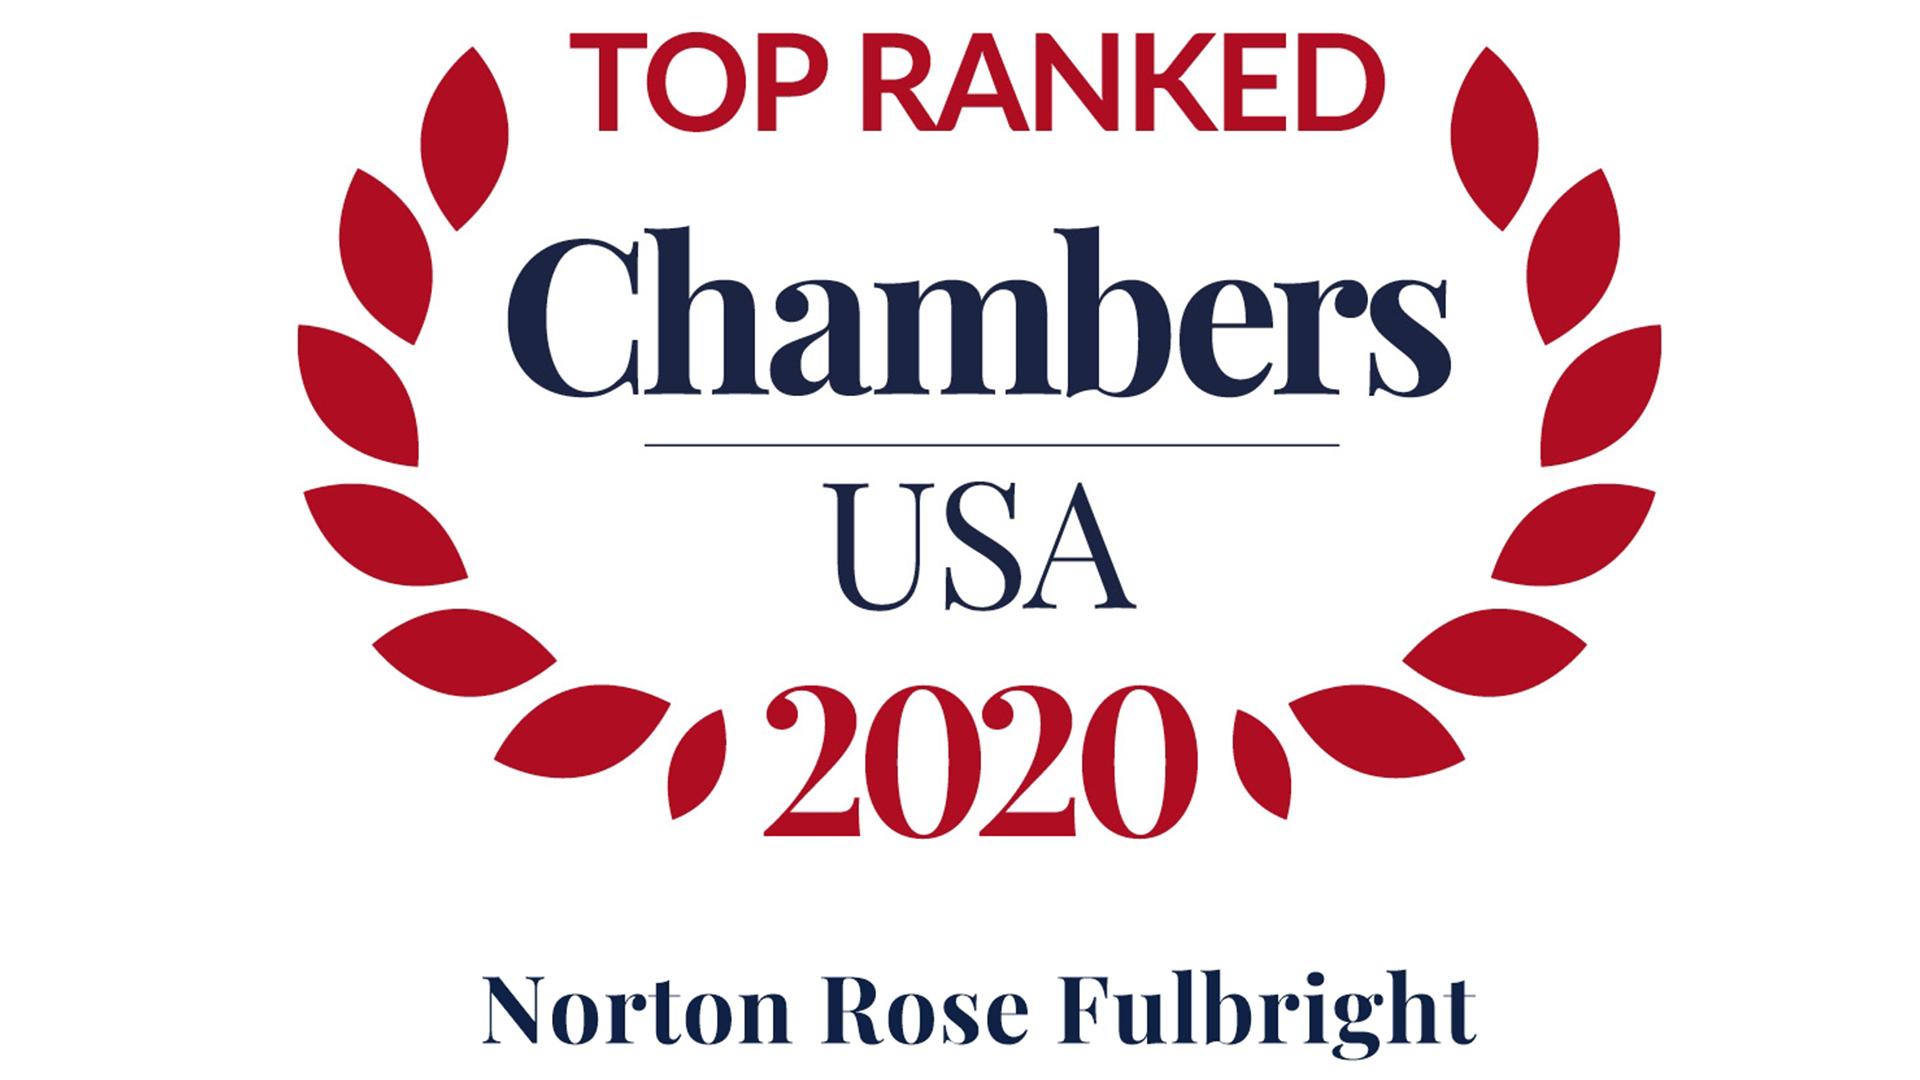 Top ranked Chambers USA 2020